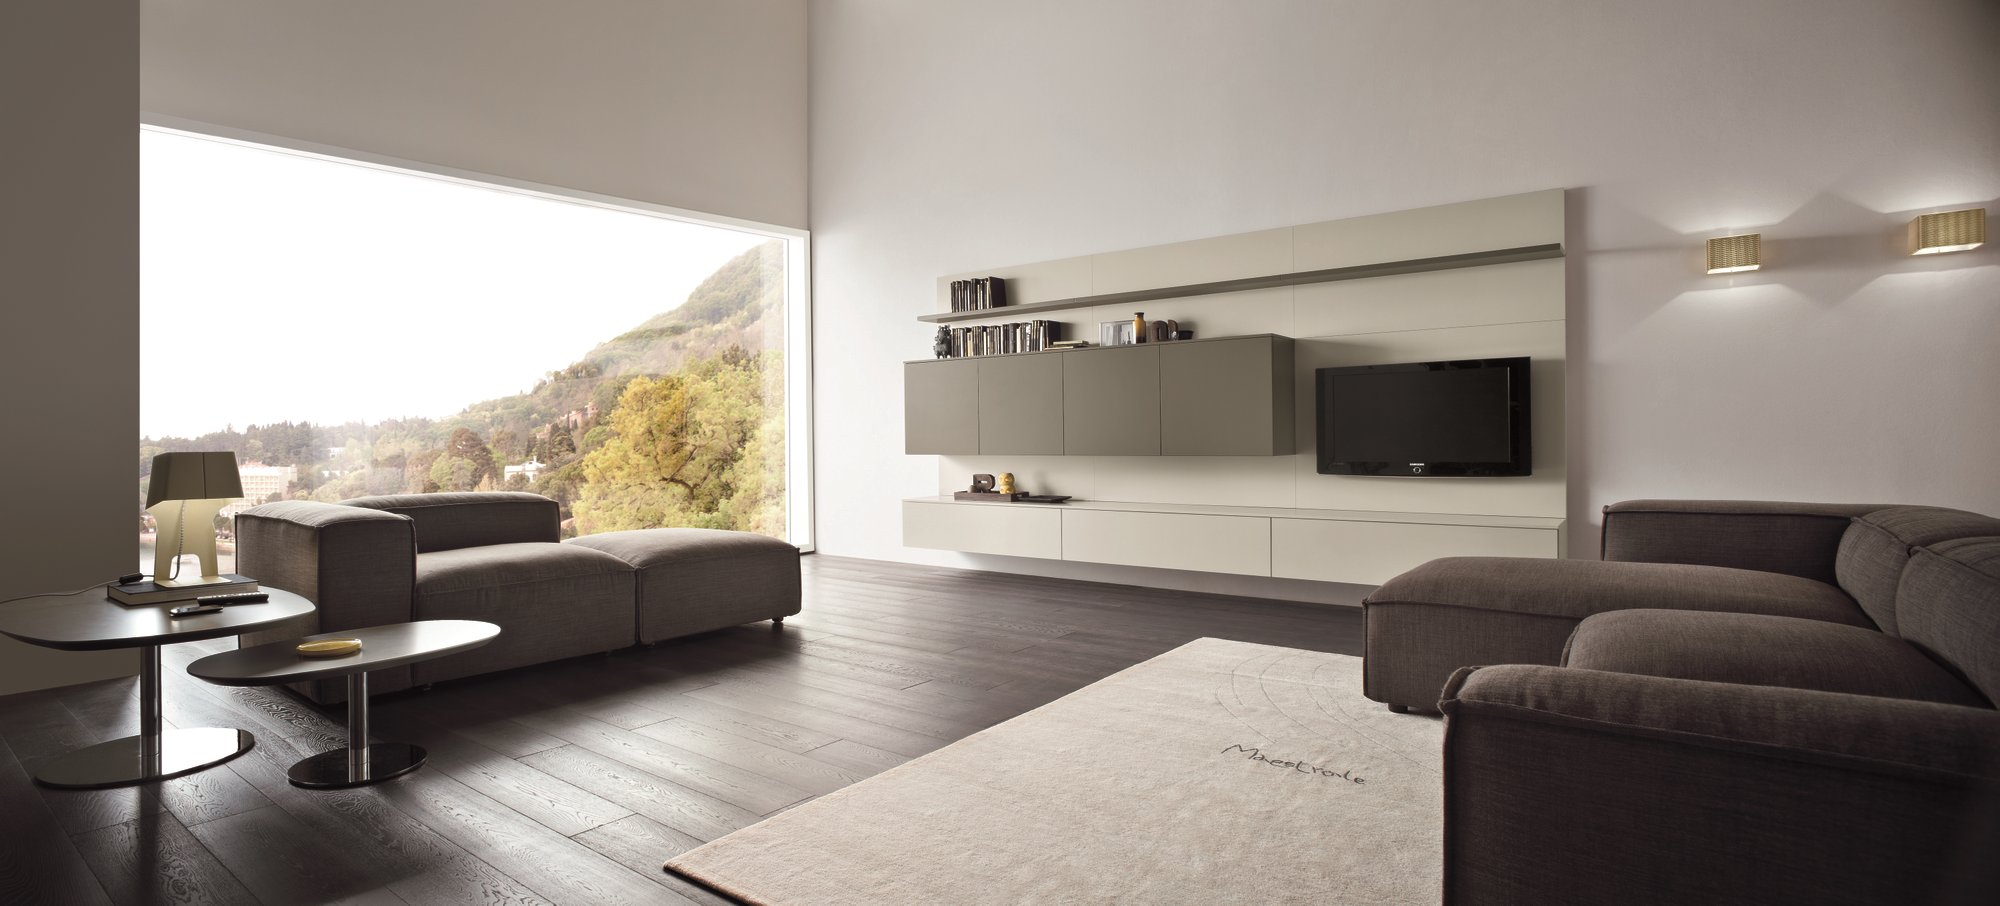 Anbau  tv  wohnwand slim 14 by dall'agnese design imago design ...